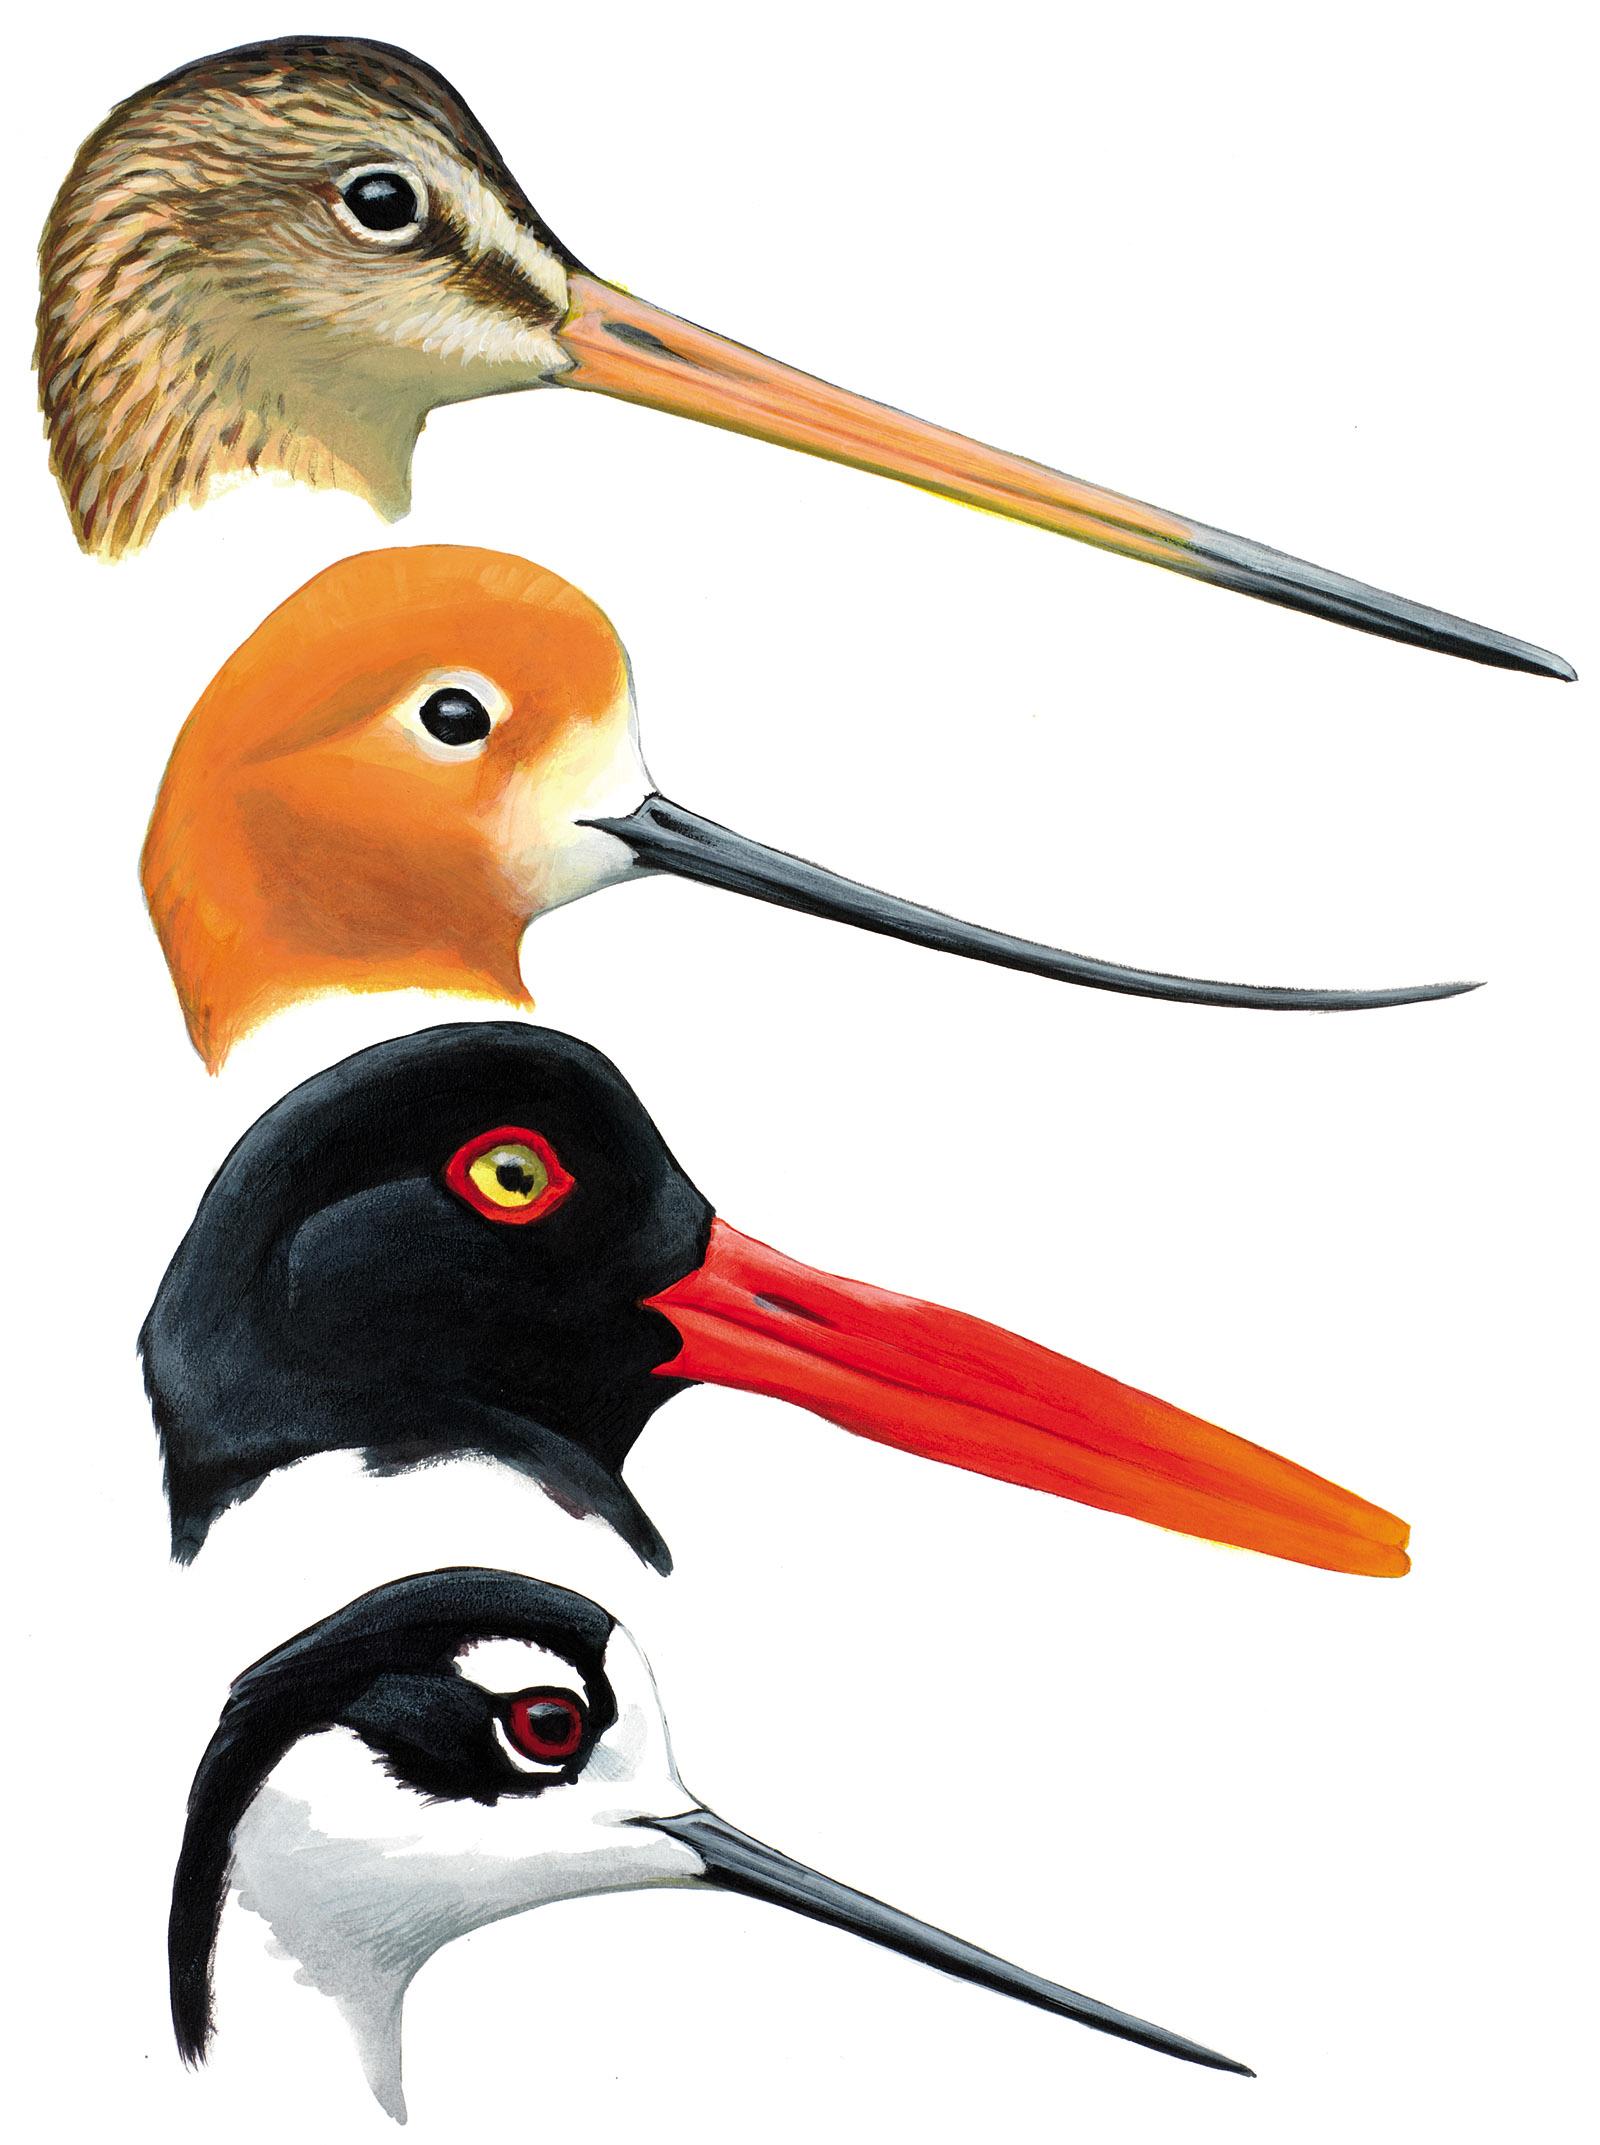 Illustration of four shorebirds: the marbled godwit, American avocet, American oystercatcher, and black-necked stilt